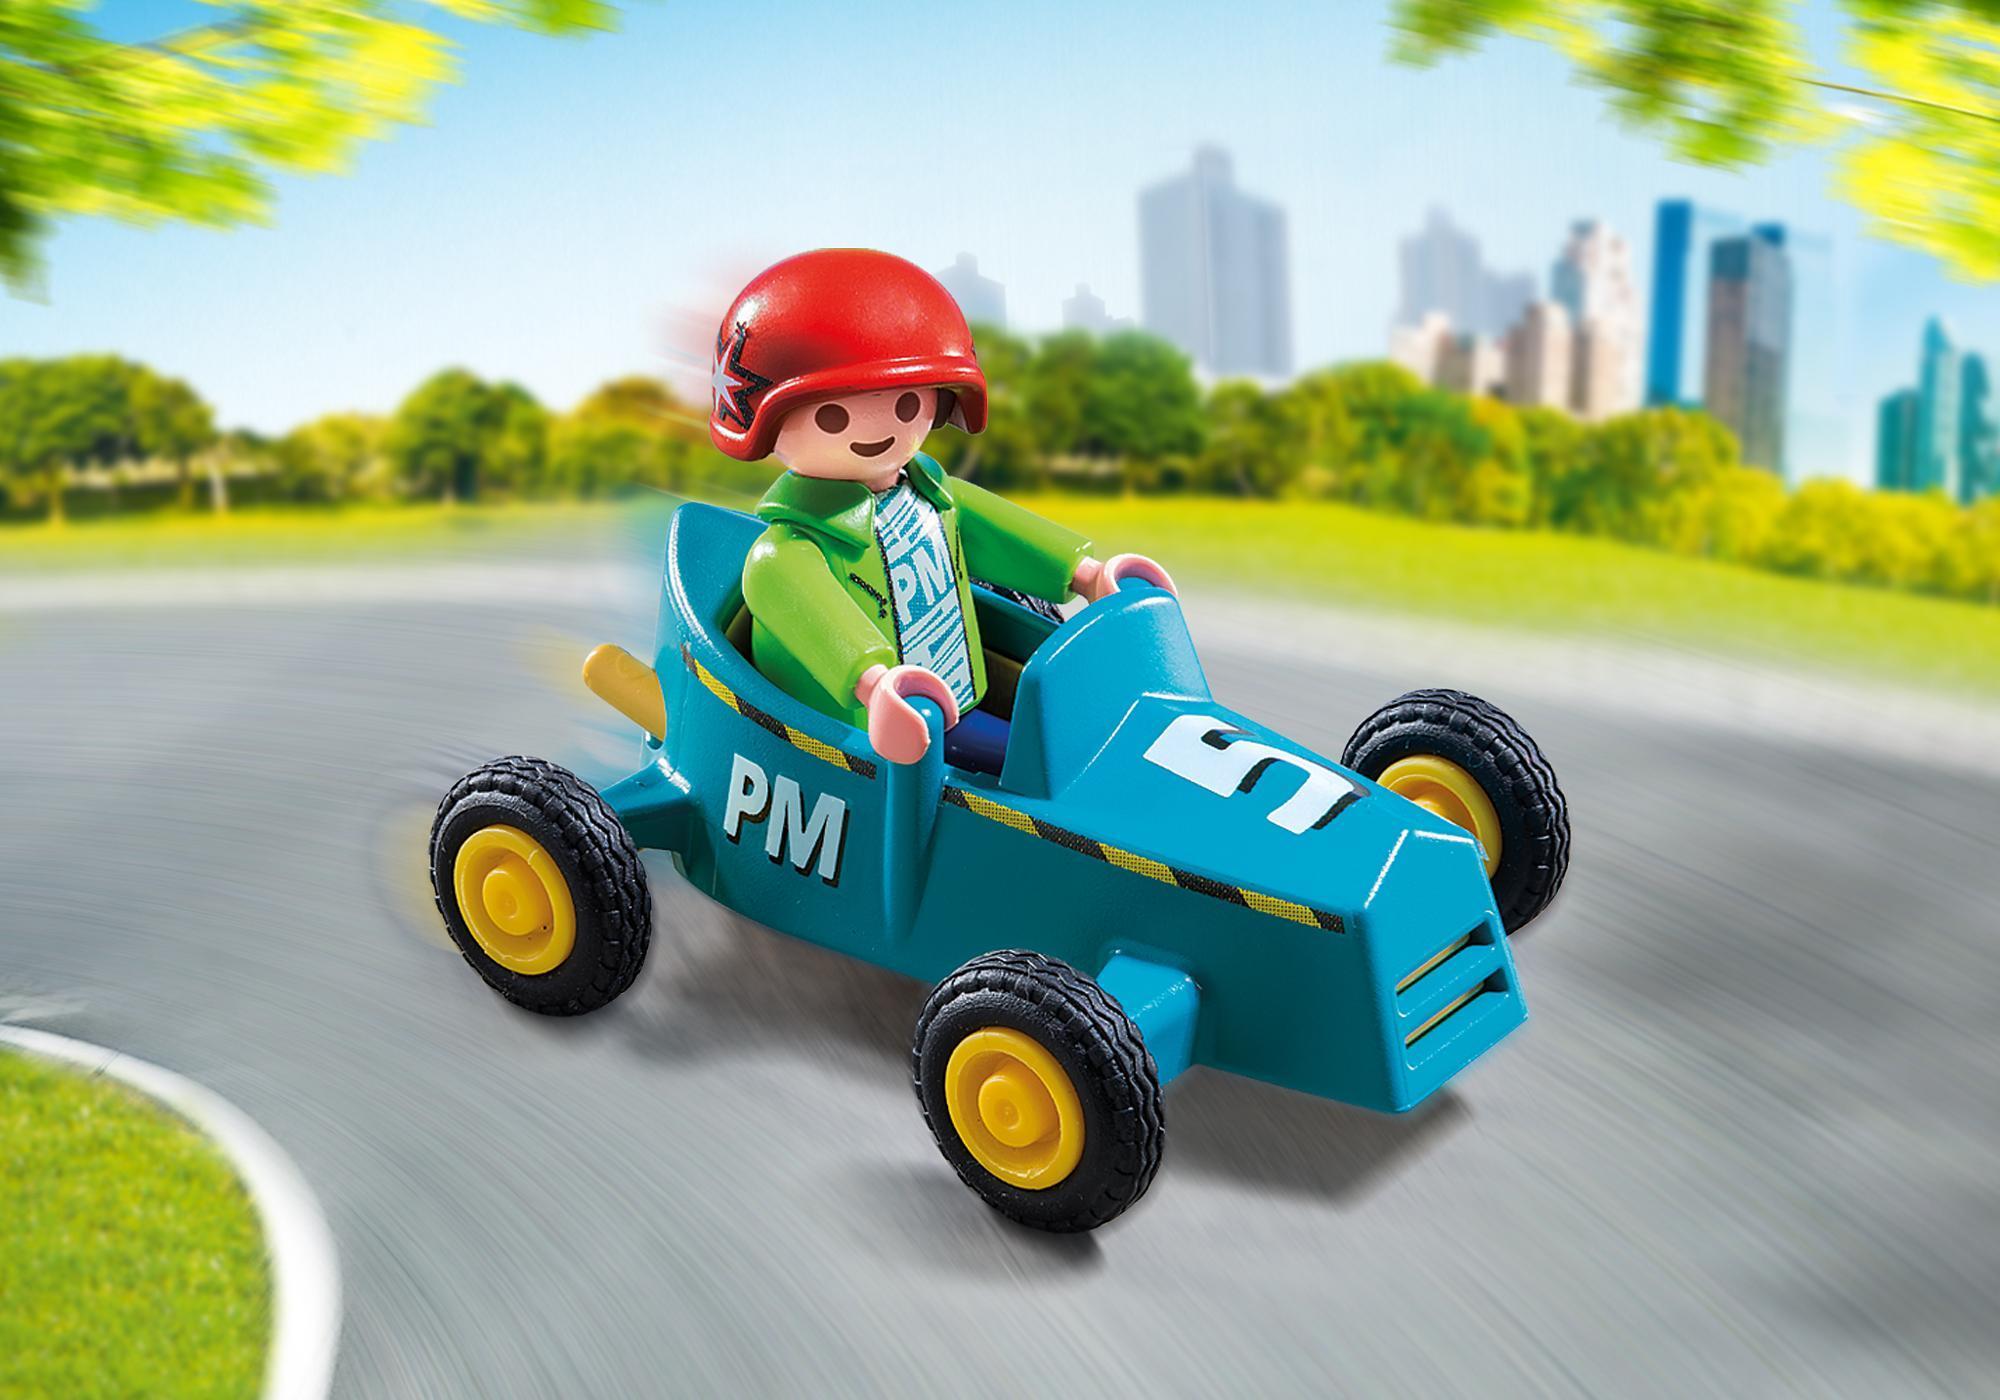 http://media.playmobil.com/i/playmobil/5382_product_detail/Pojke med kartvagn